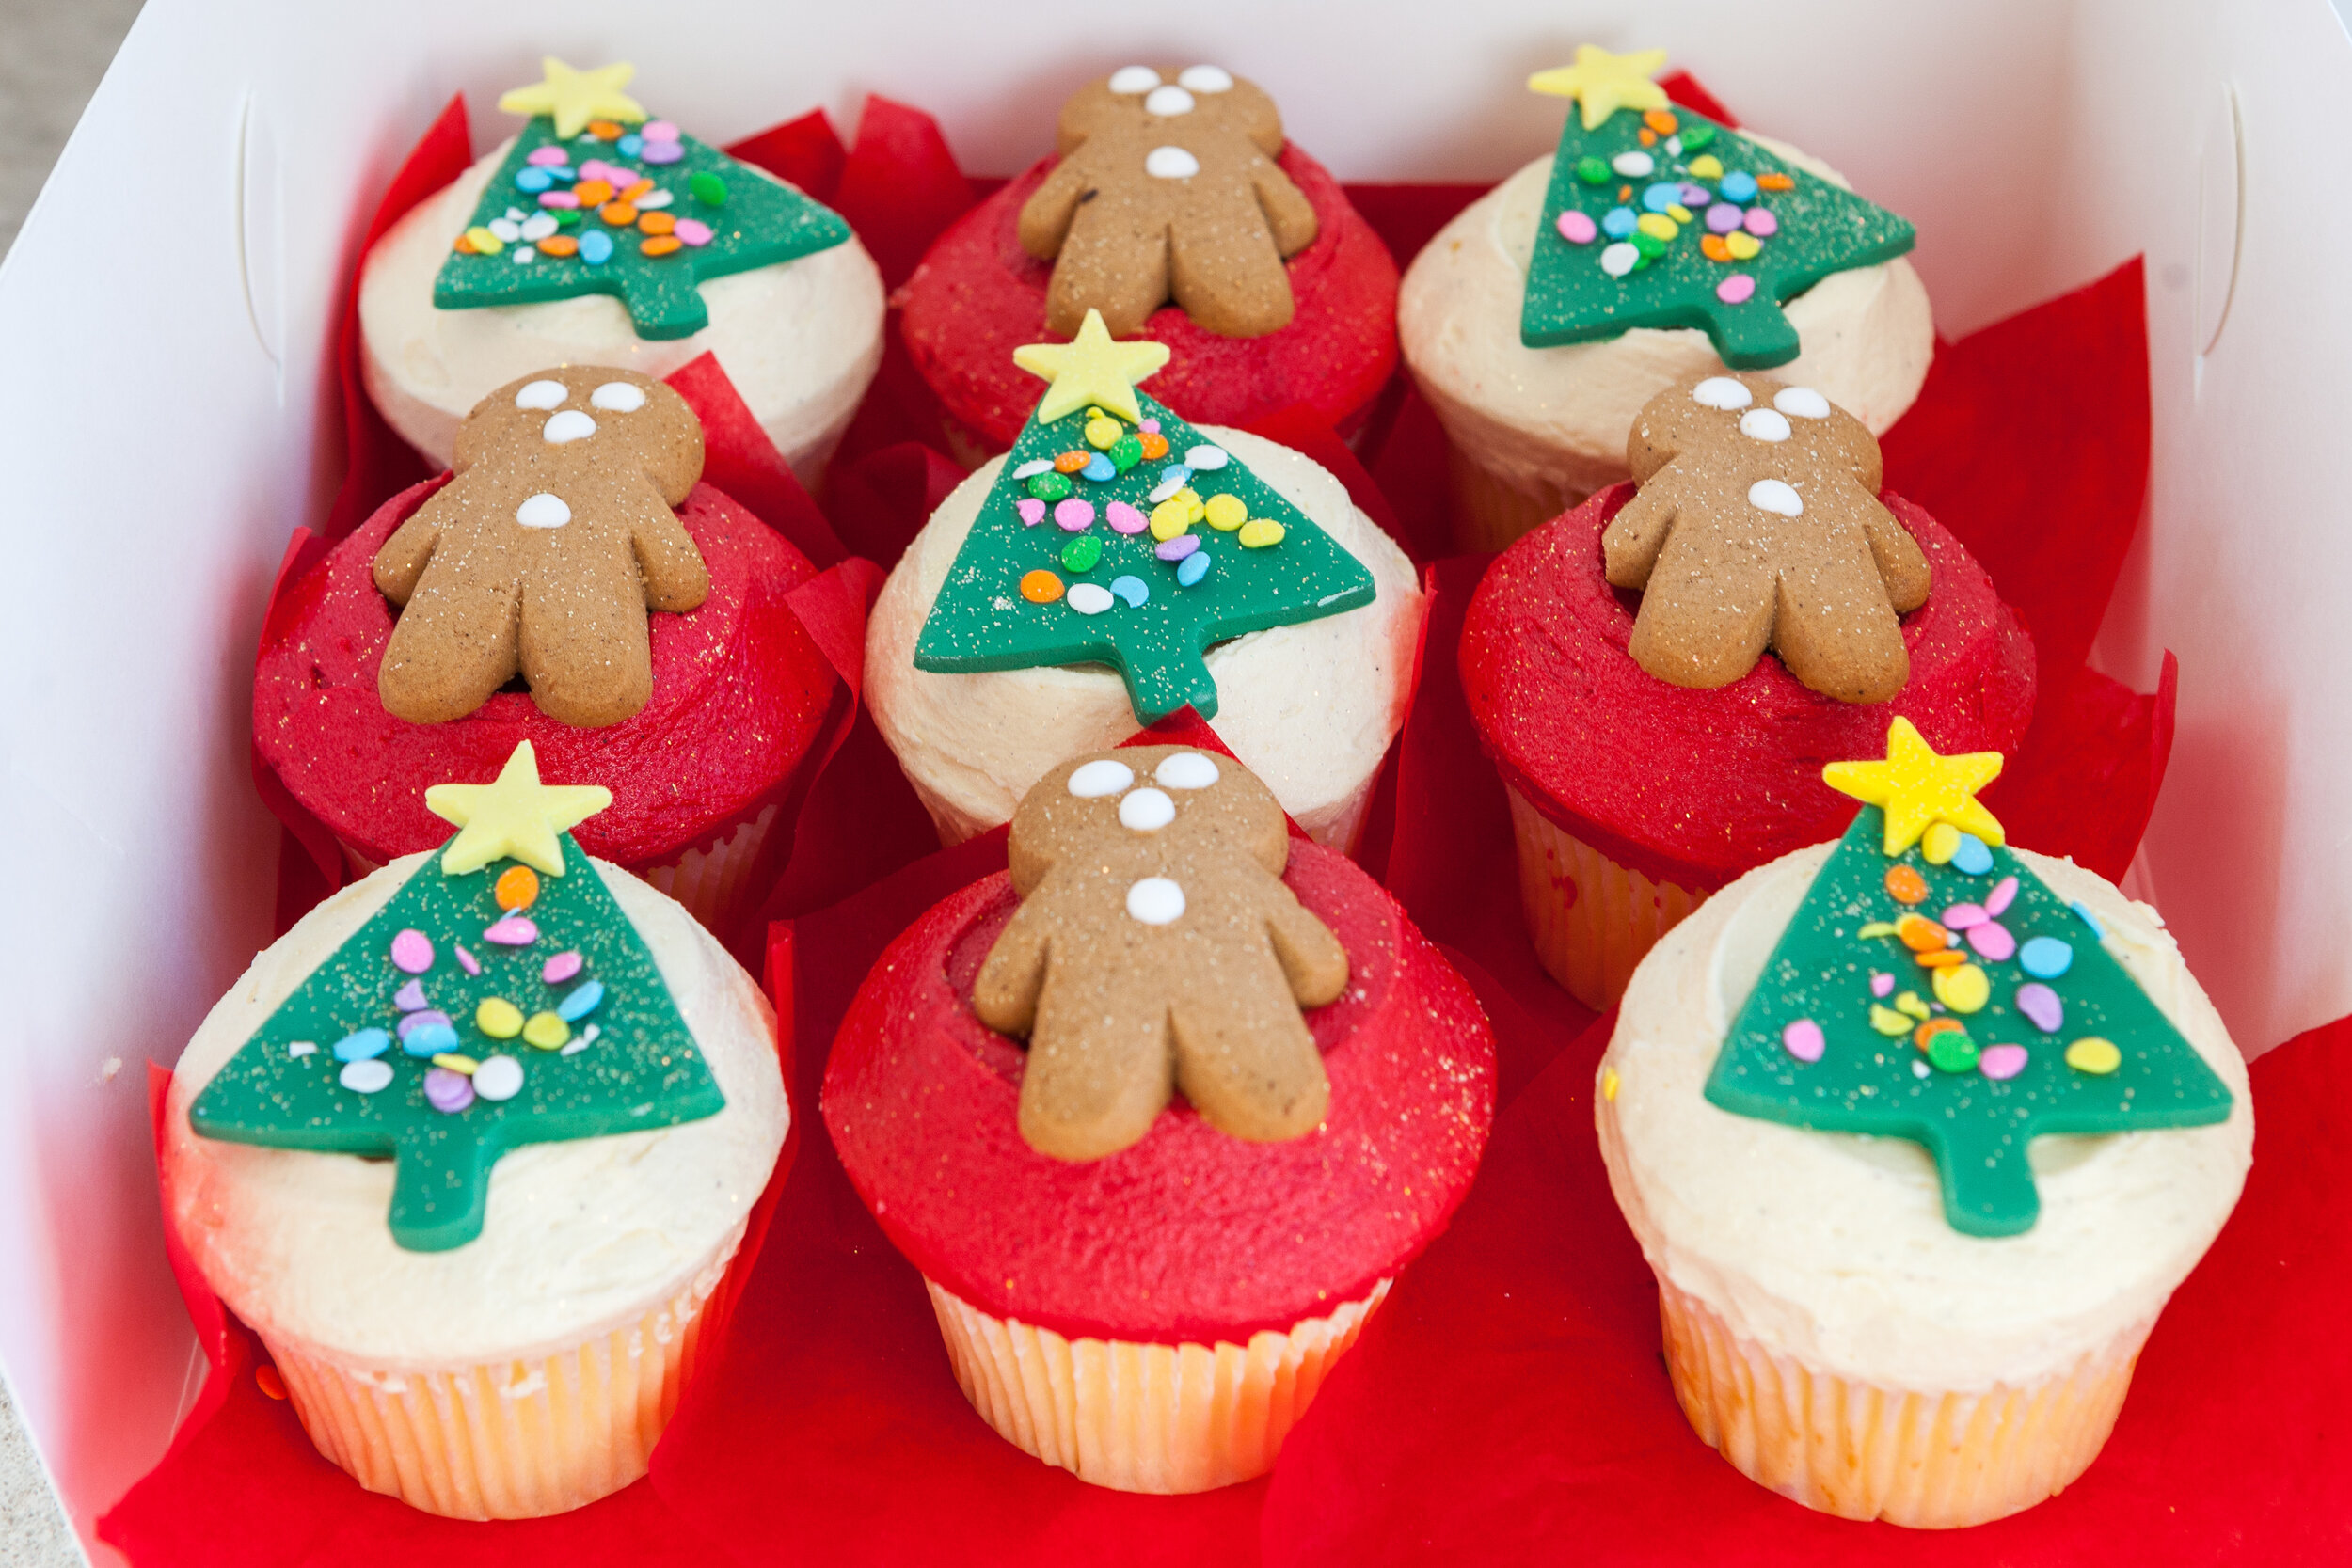 Vanillapodspecialtycakes_Christmas2019-71.jpg